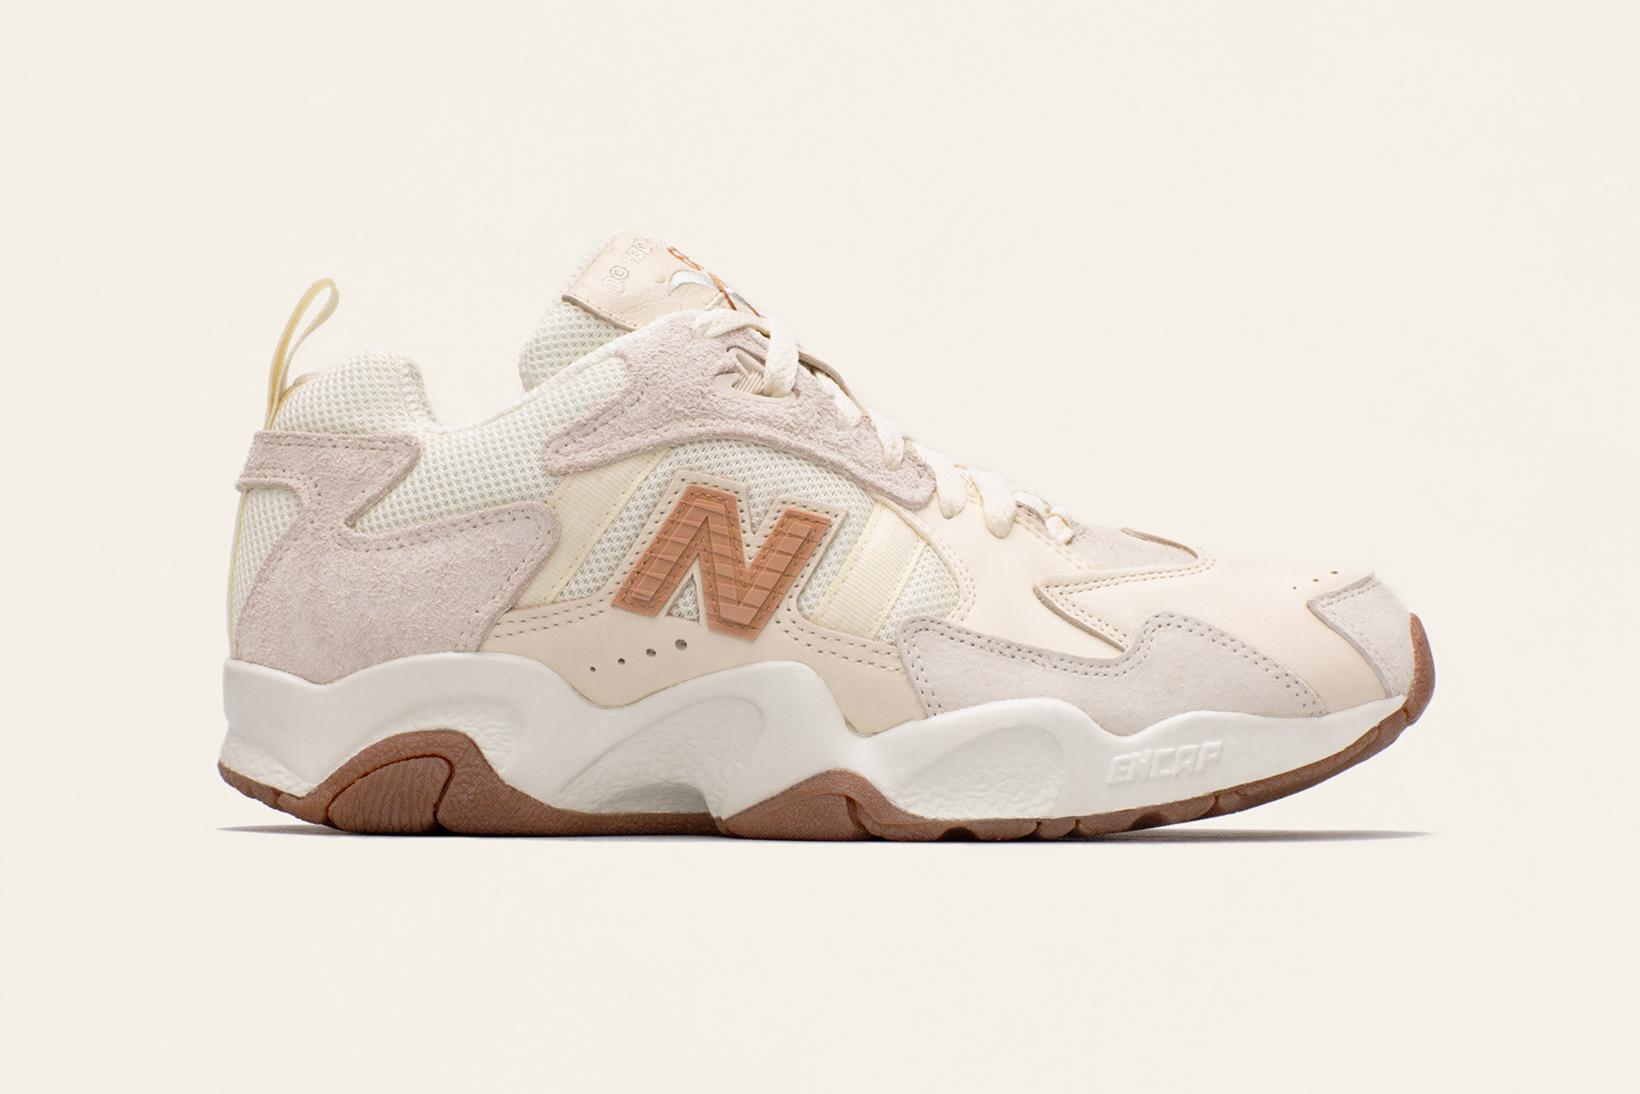 No Vacancy Inn New Balance 650 Sneakers Collaboration